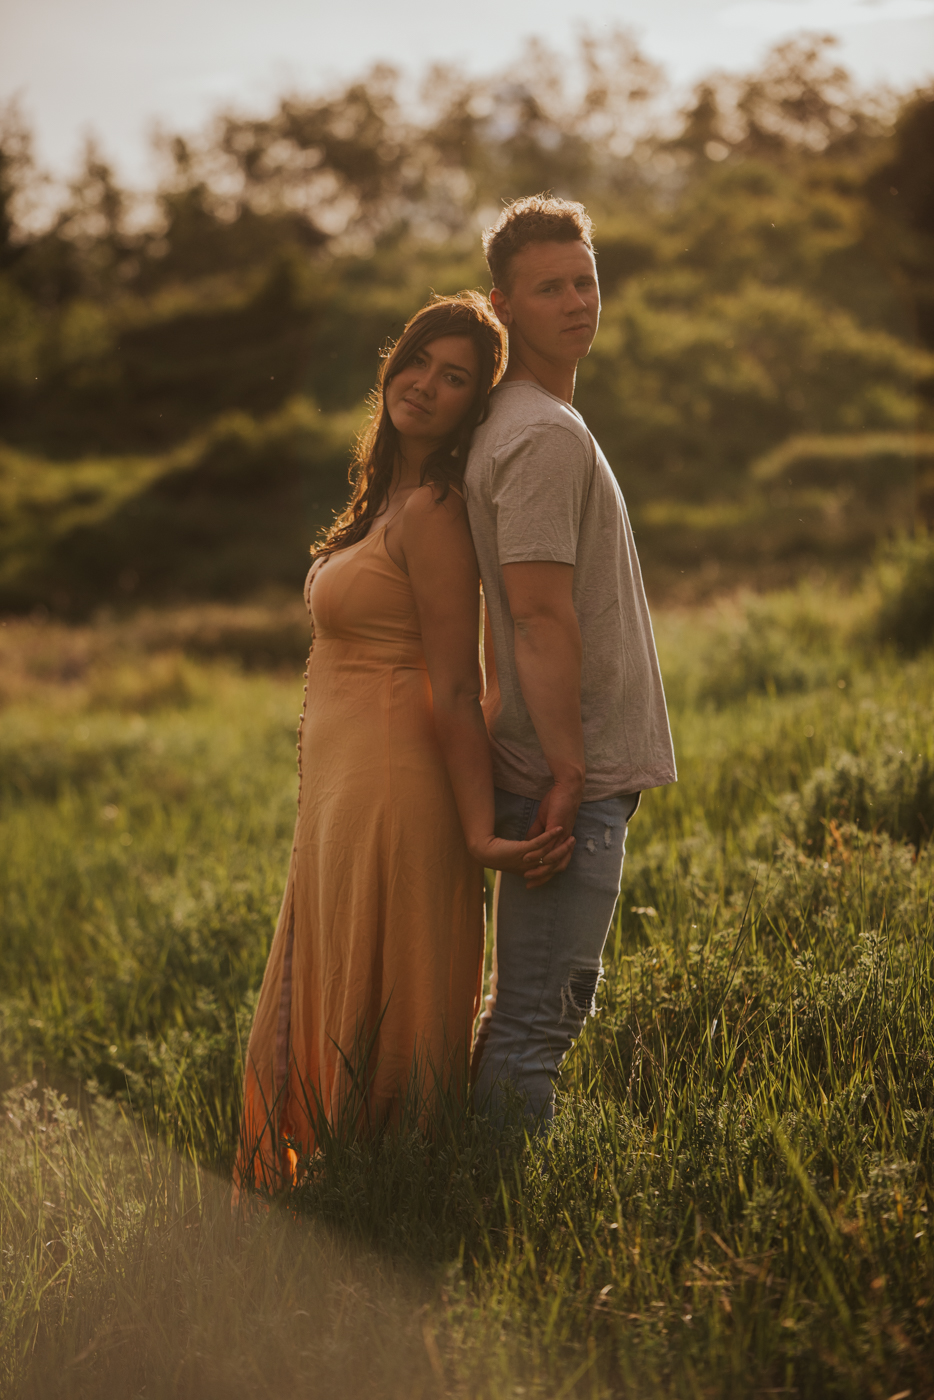 tyraephotography_photographer_wedding_elopement_engagement_photography-6206.jpg